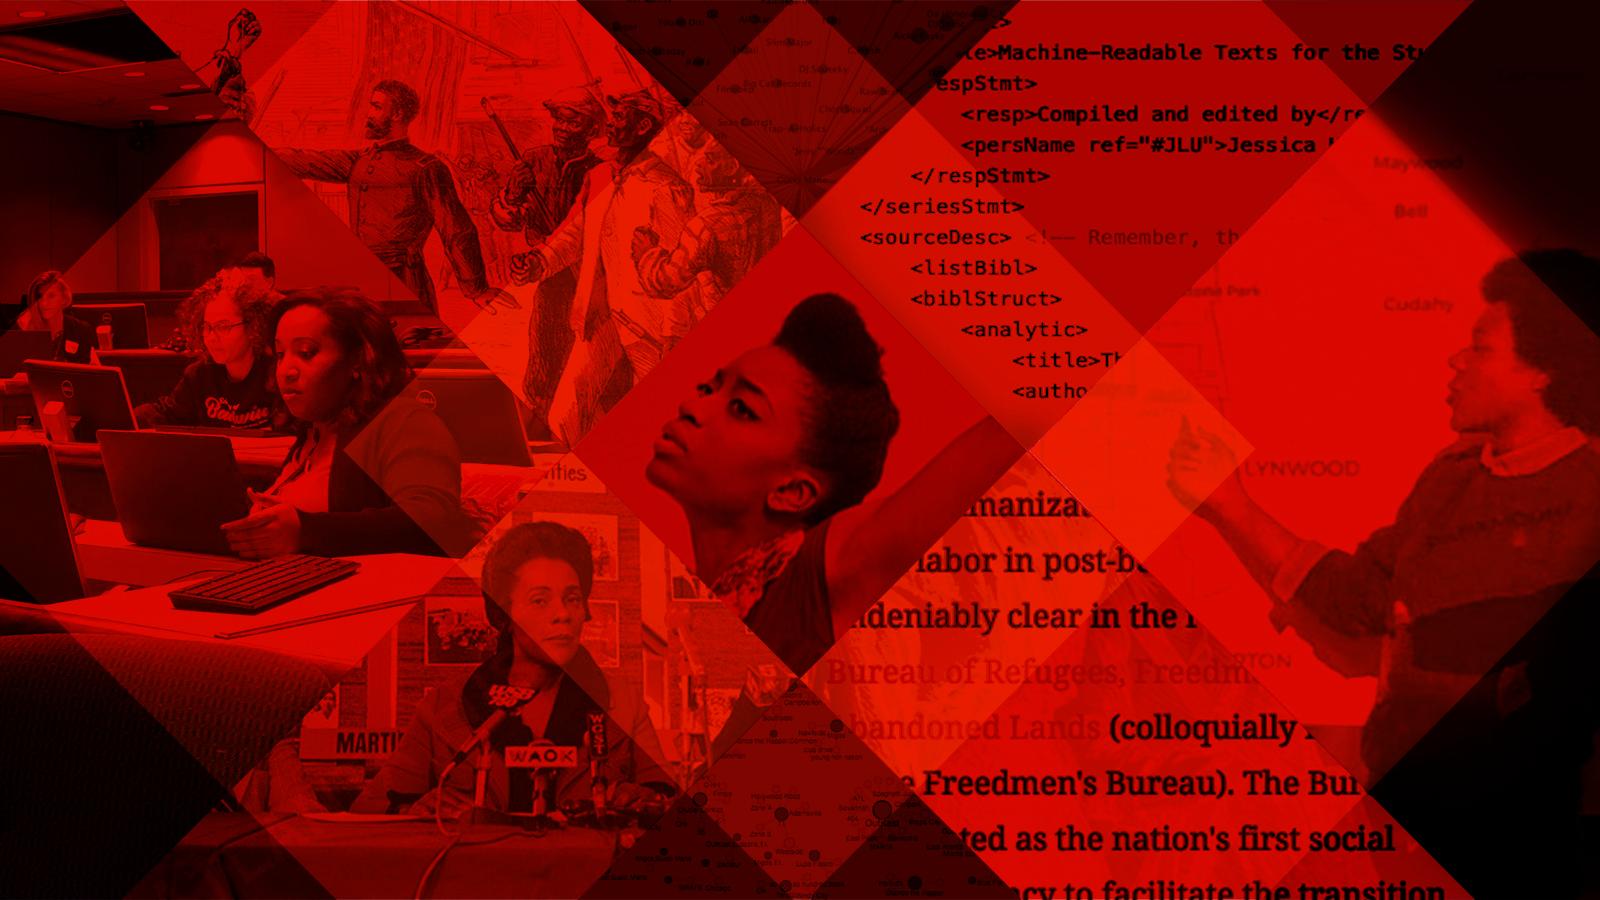 Mellon Foundation Awards $2M to Advance Black Studies and